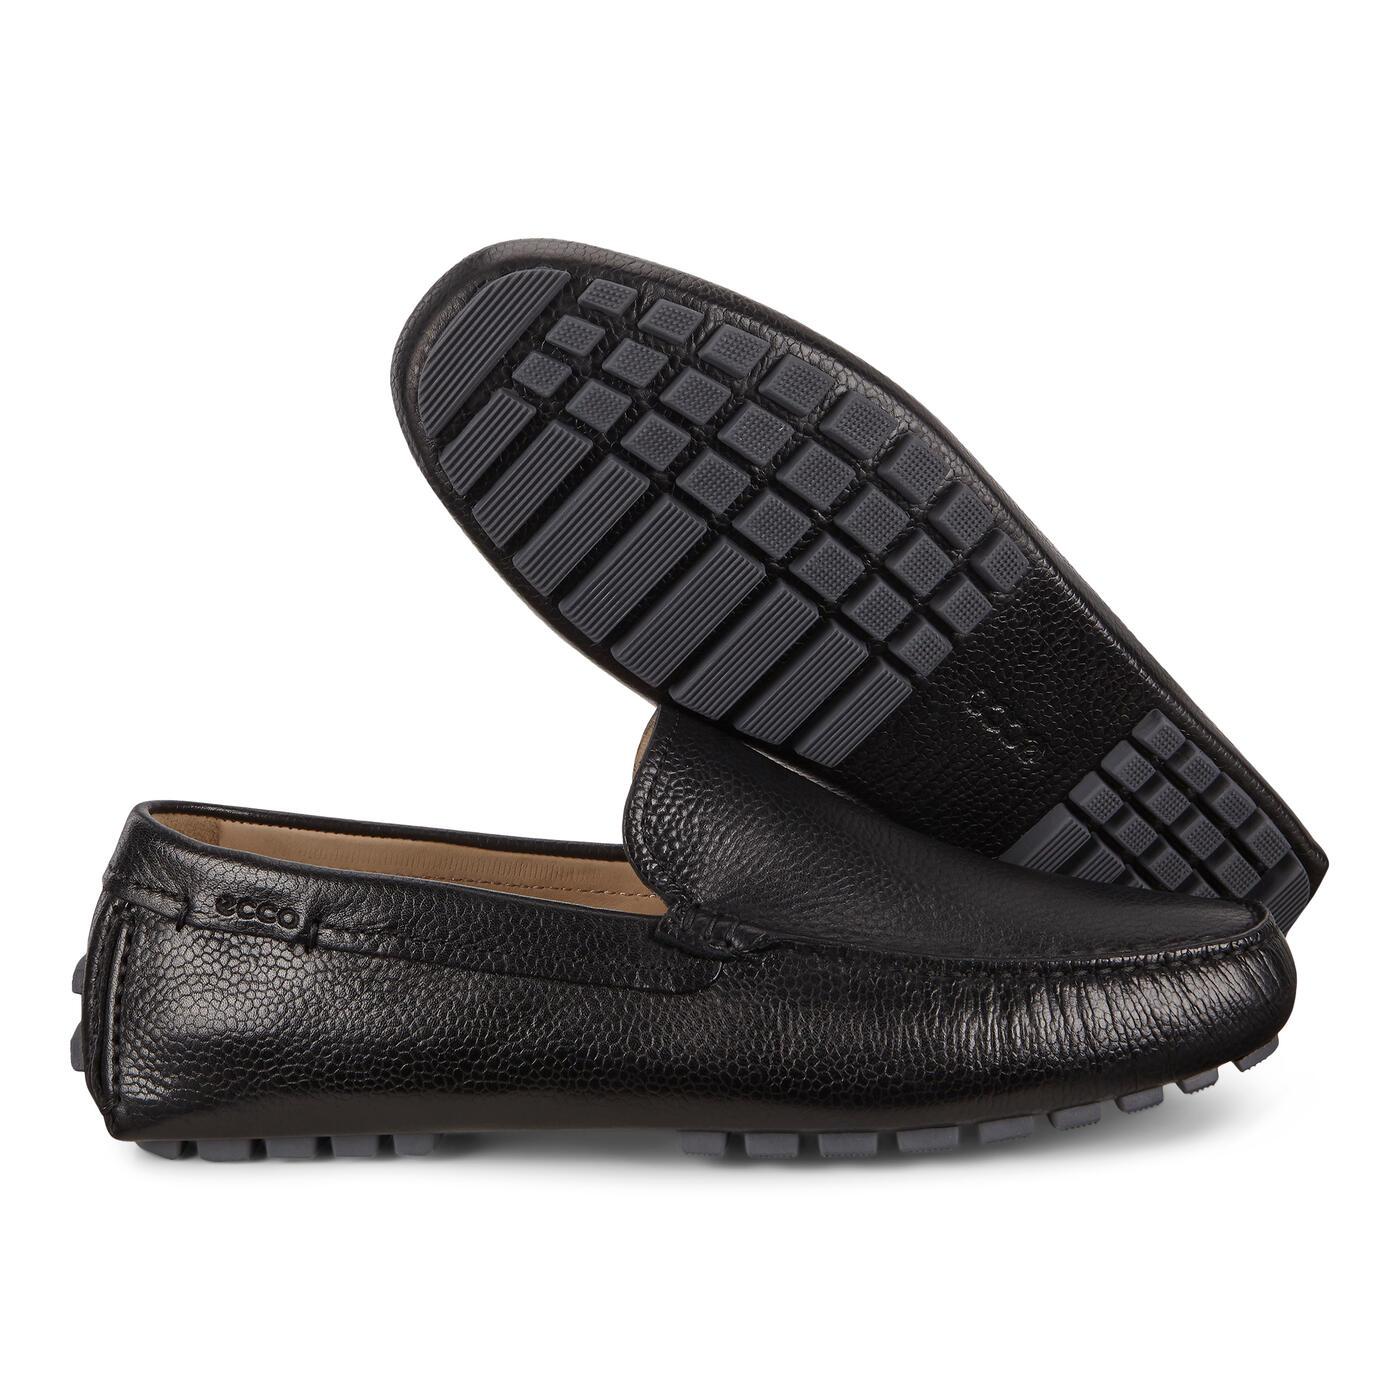 Ecco Dynamic Men's Moc 2.0 Loafers